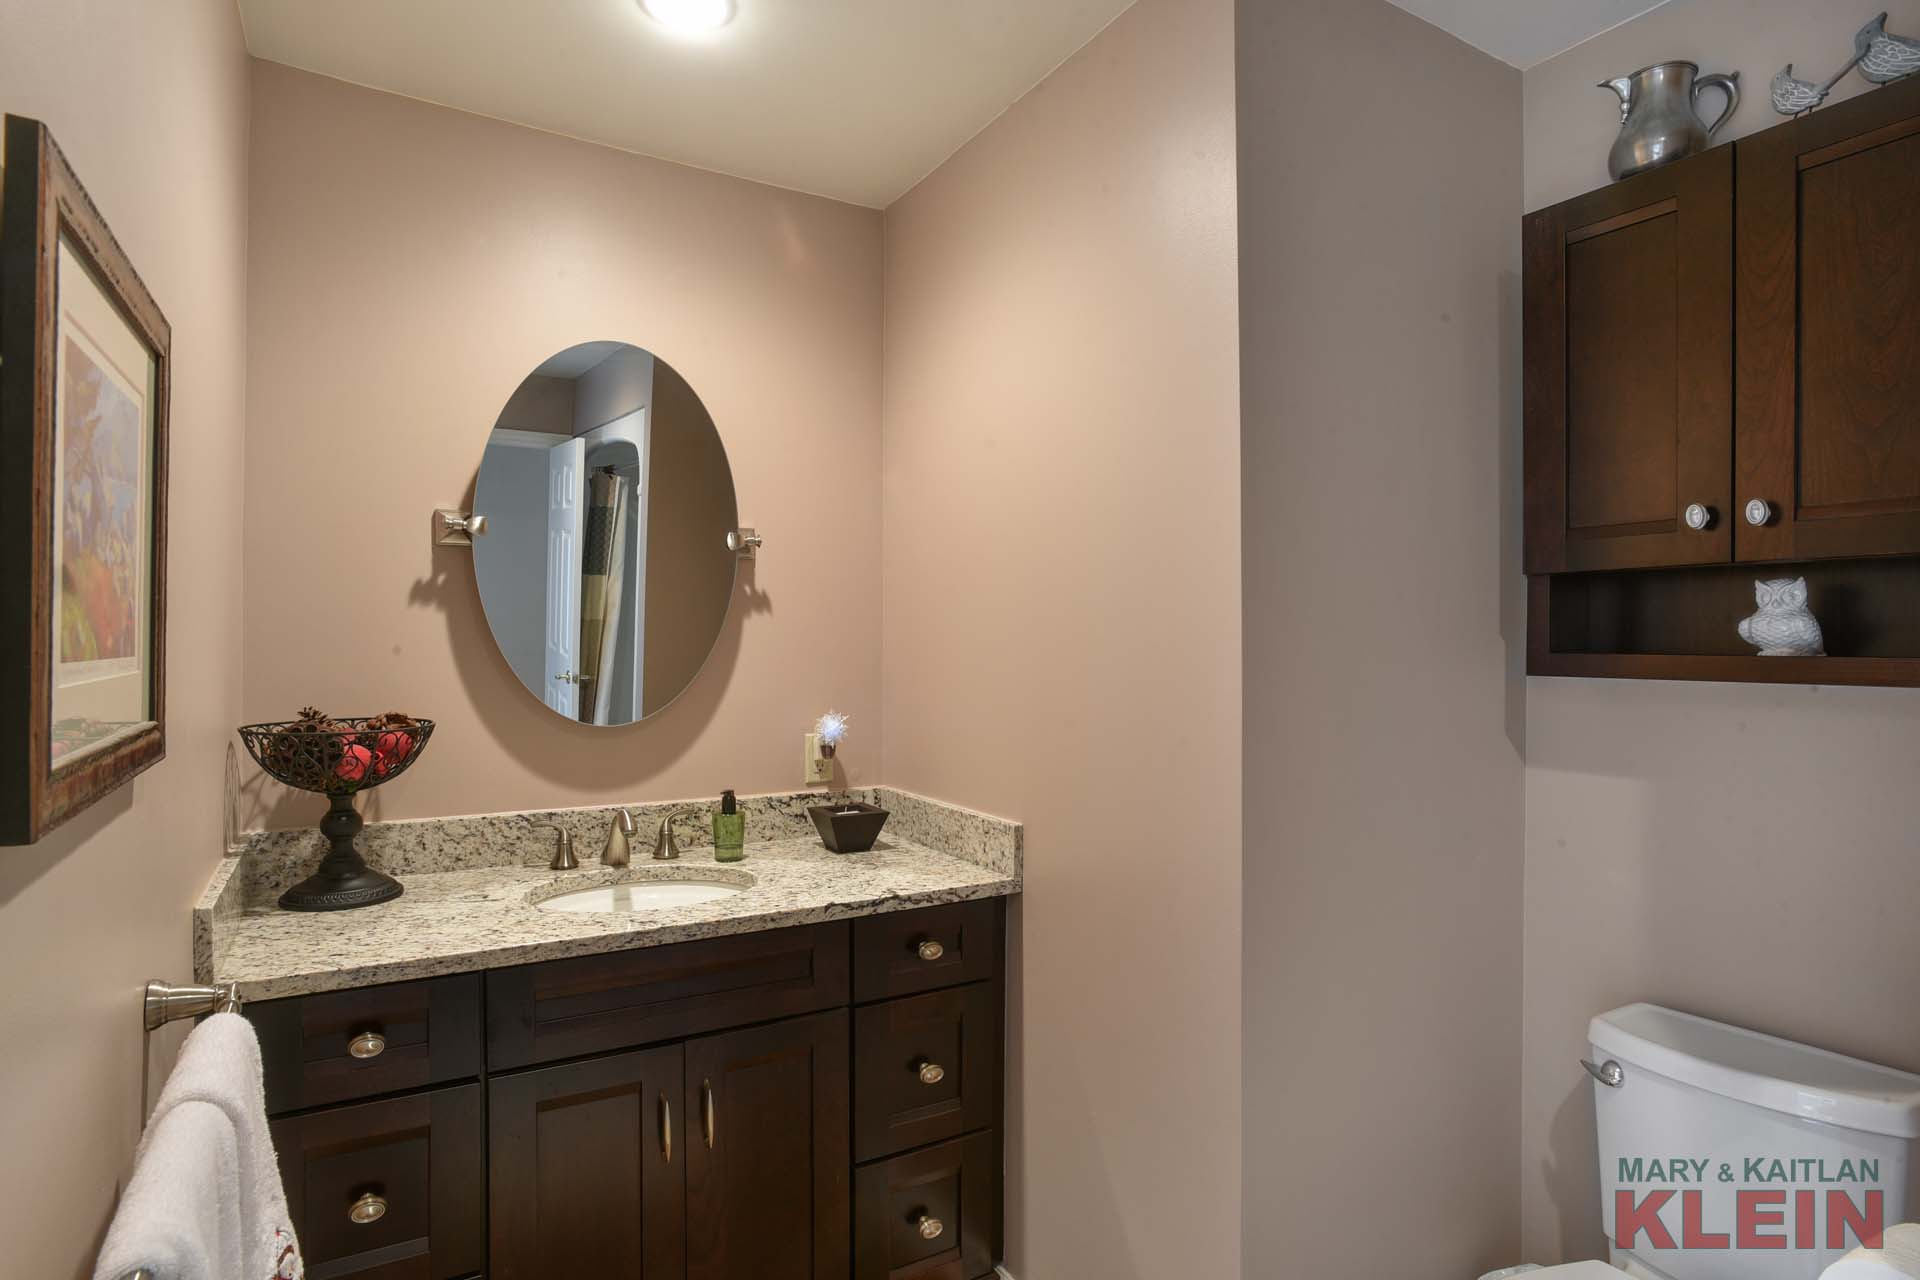 4-Piece Main Bathroom